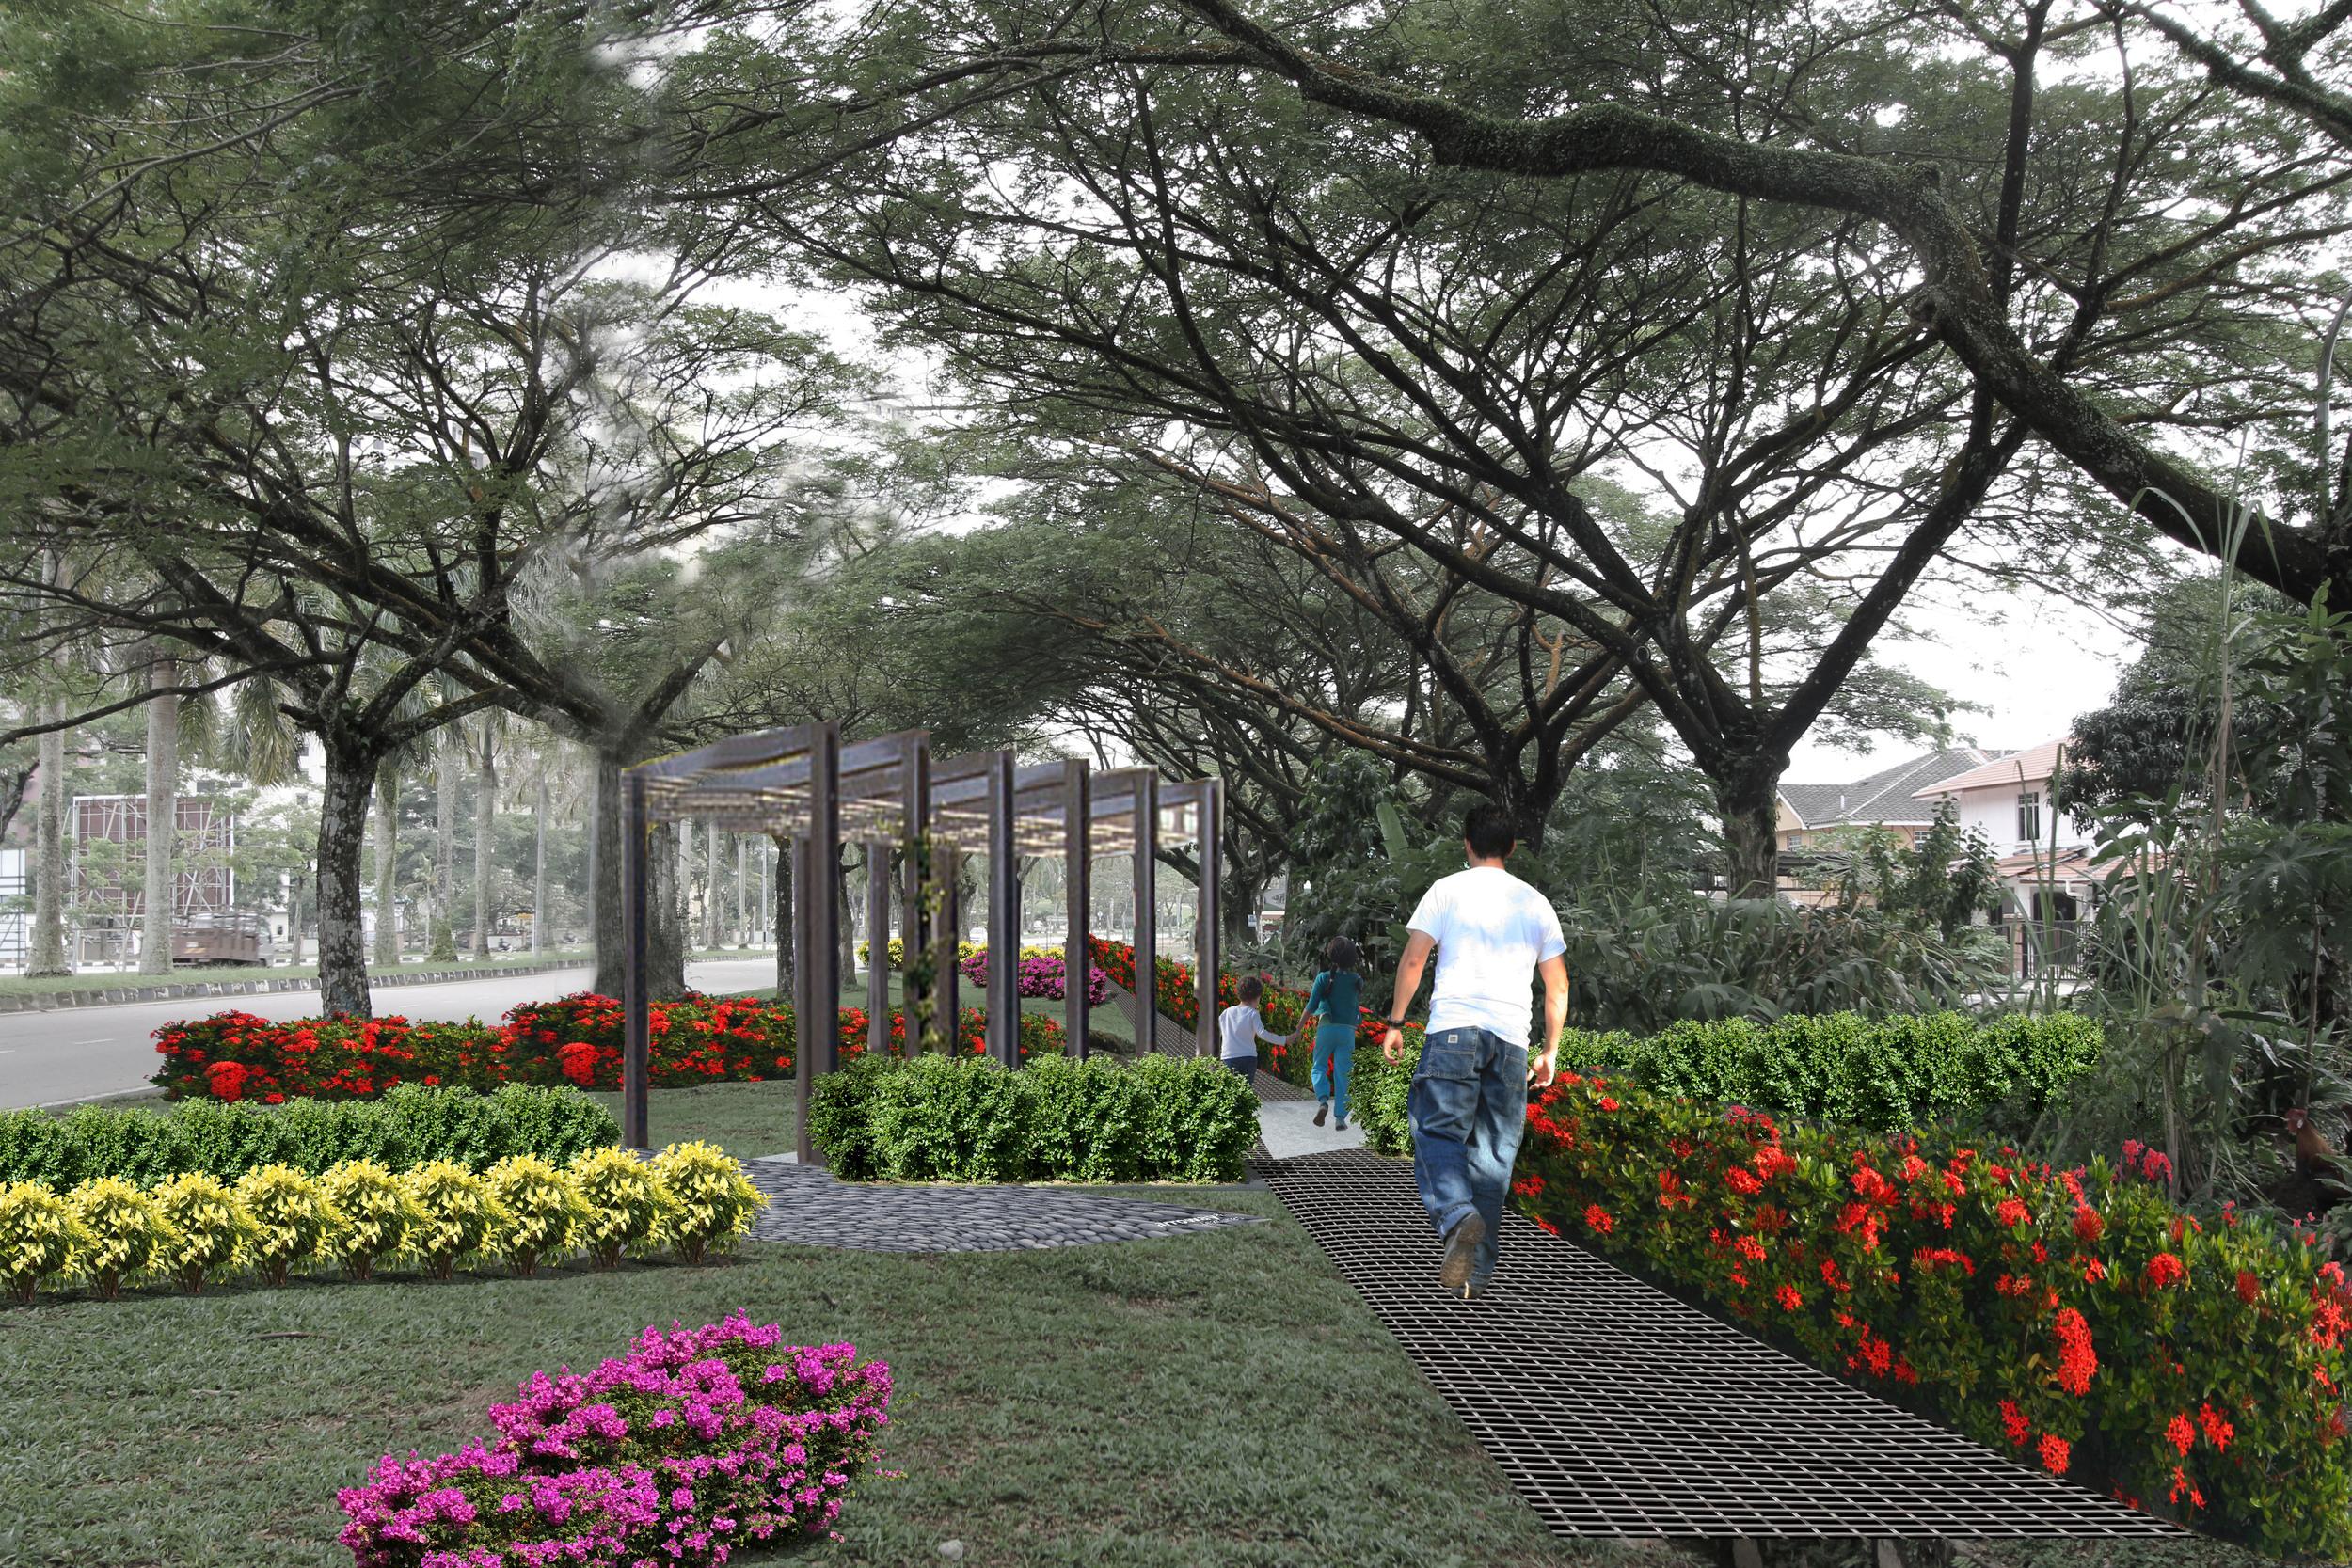 SERI ALAM URBAN REVITALISATION, JOHOR BAHRU, MALAYSIA - under construction